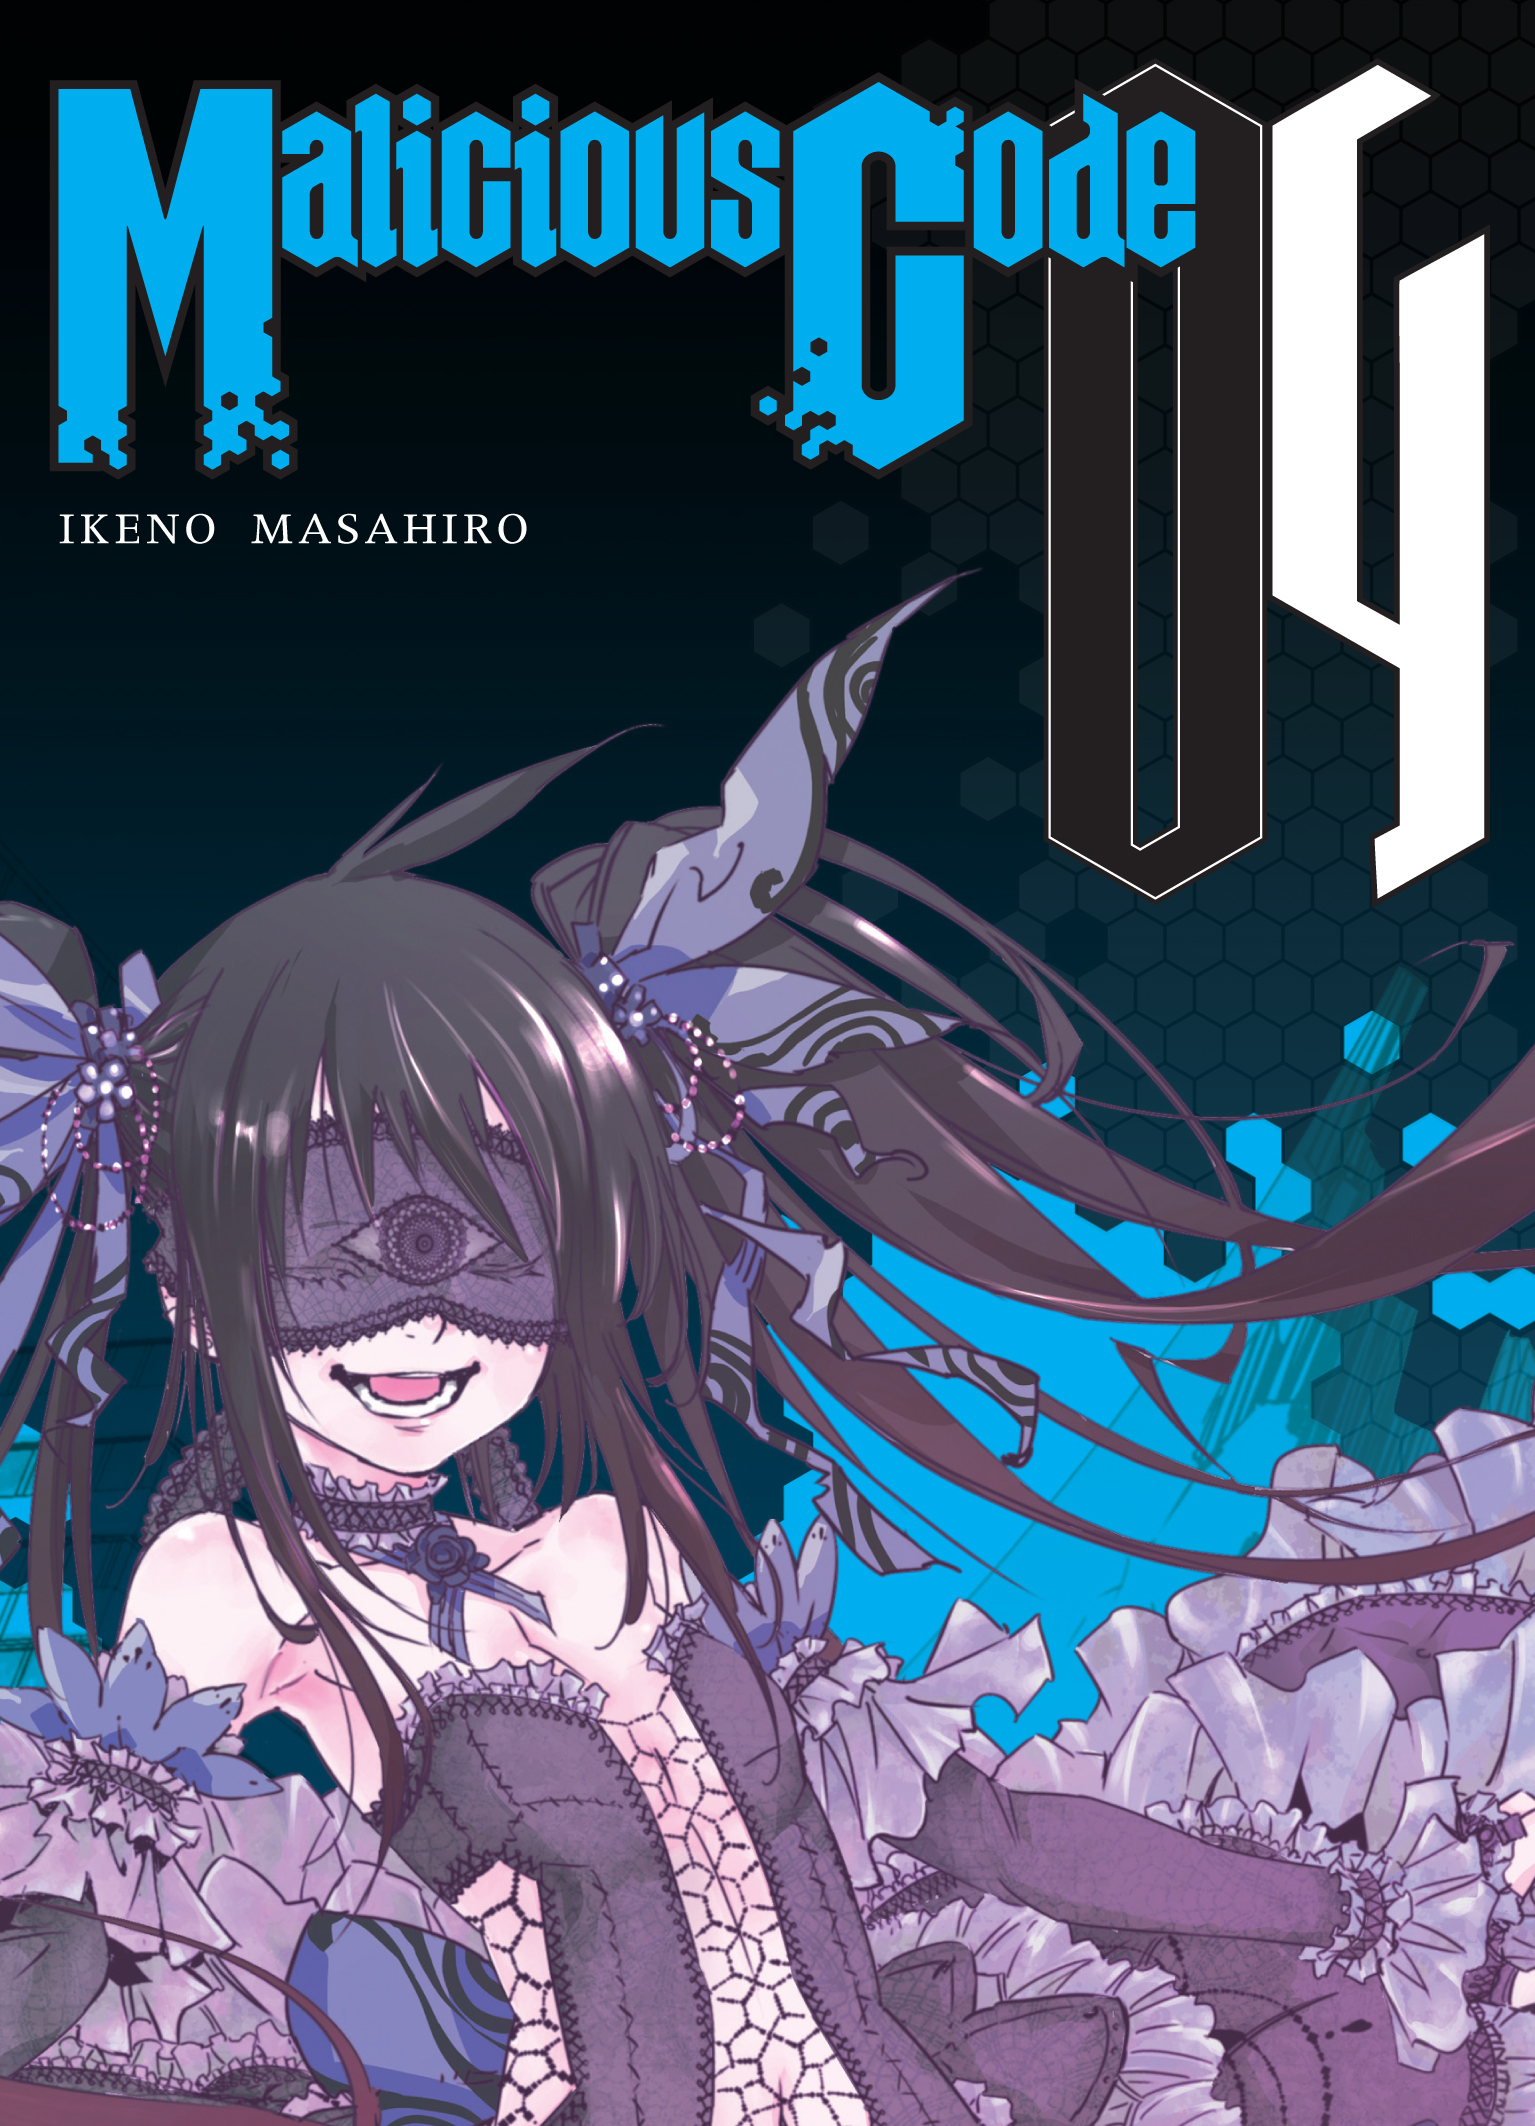 On a lu… Malicious Code (l'intégrale en 4 tomes) de Masahiro Ikeno